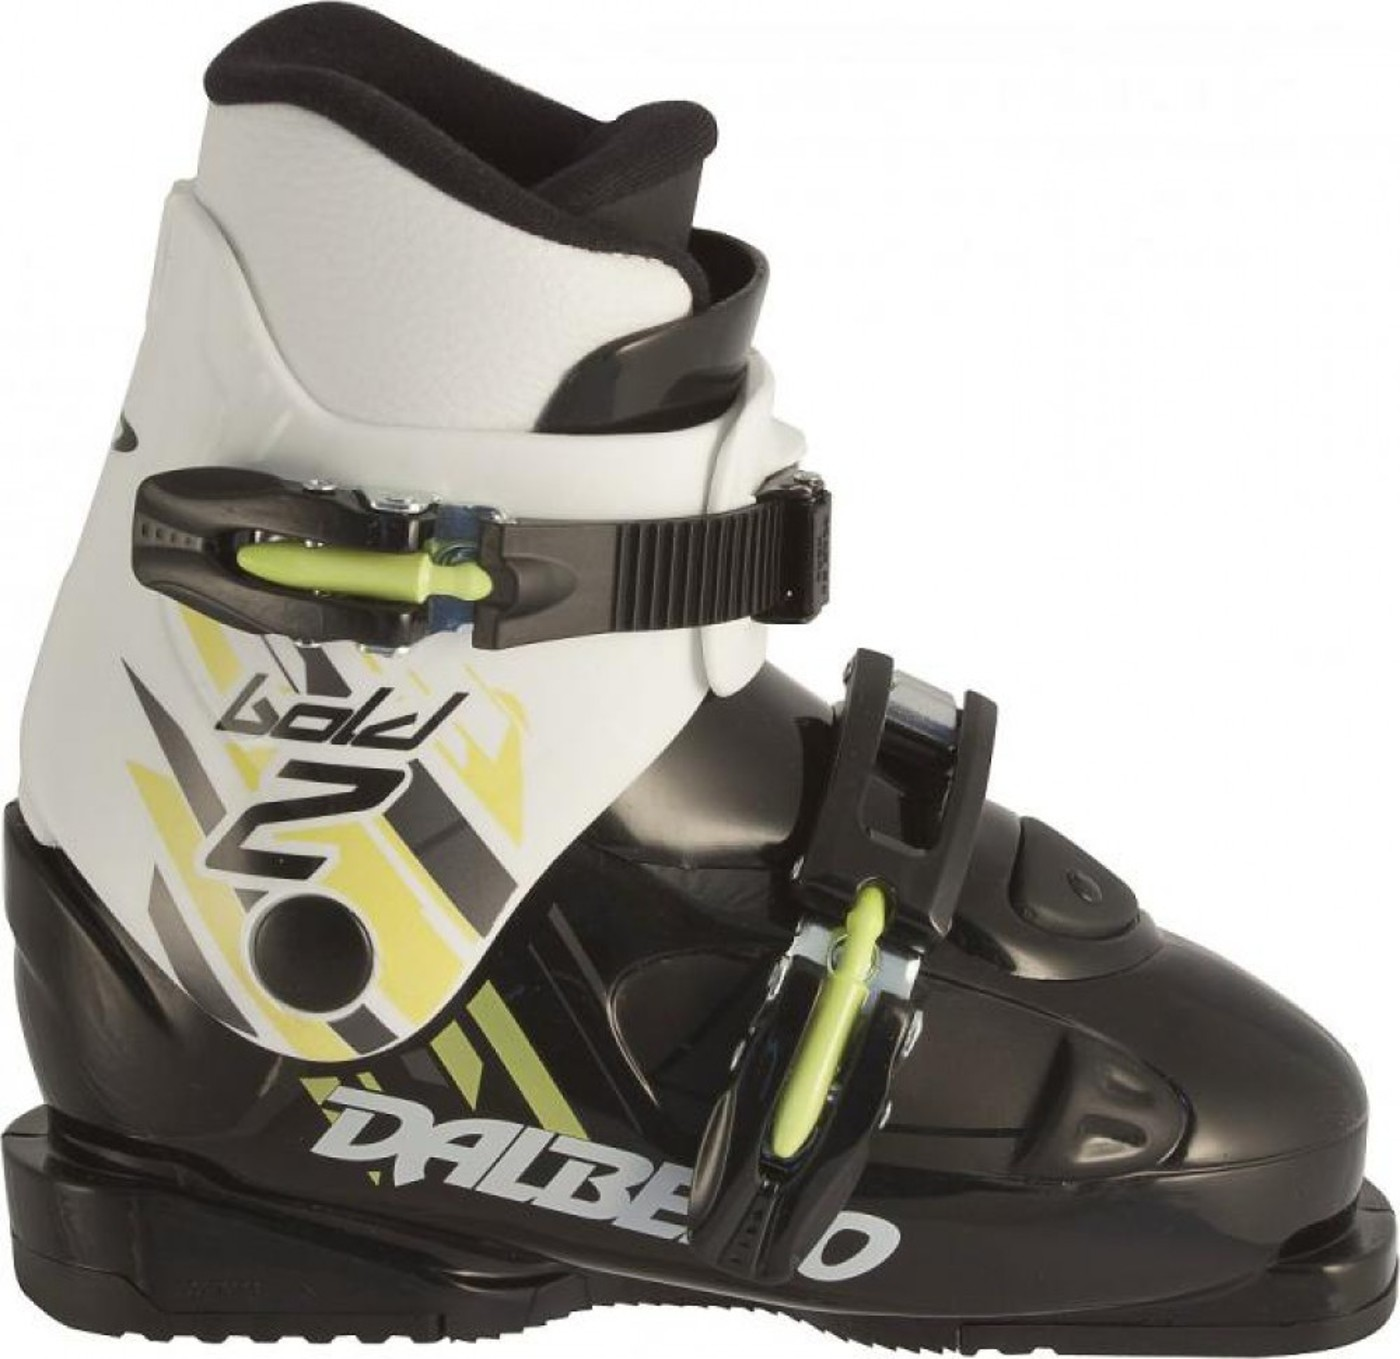 DALBELLO Skischuh BOLD 2 - Kinder